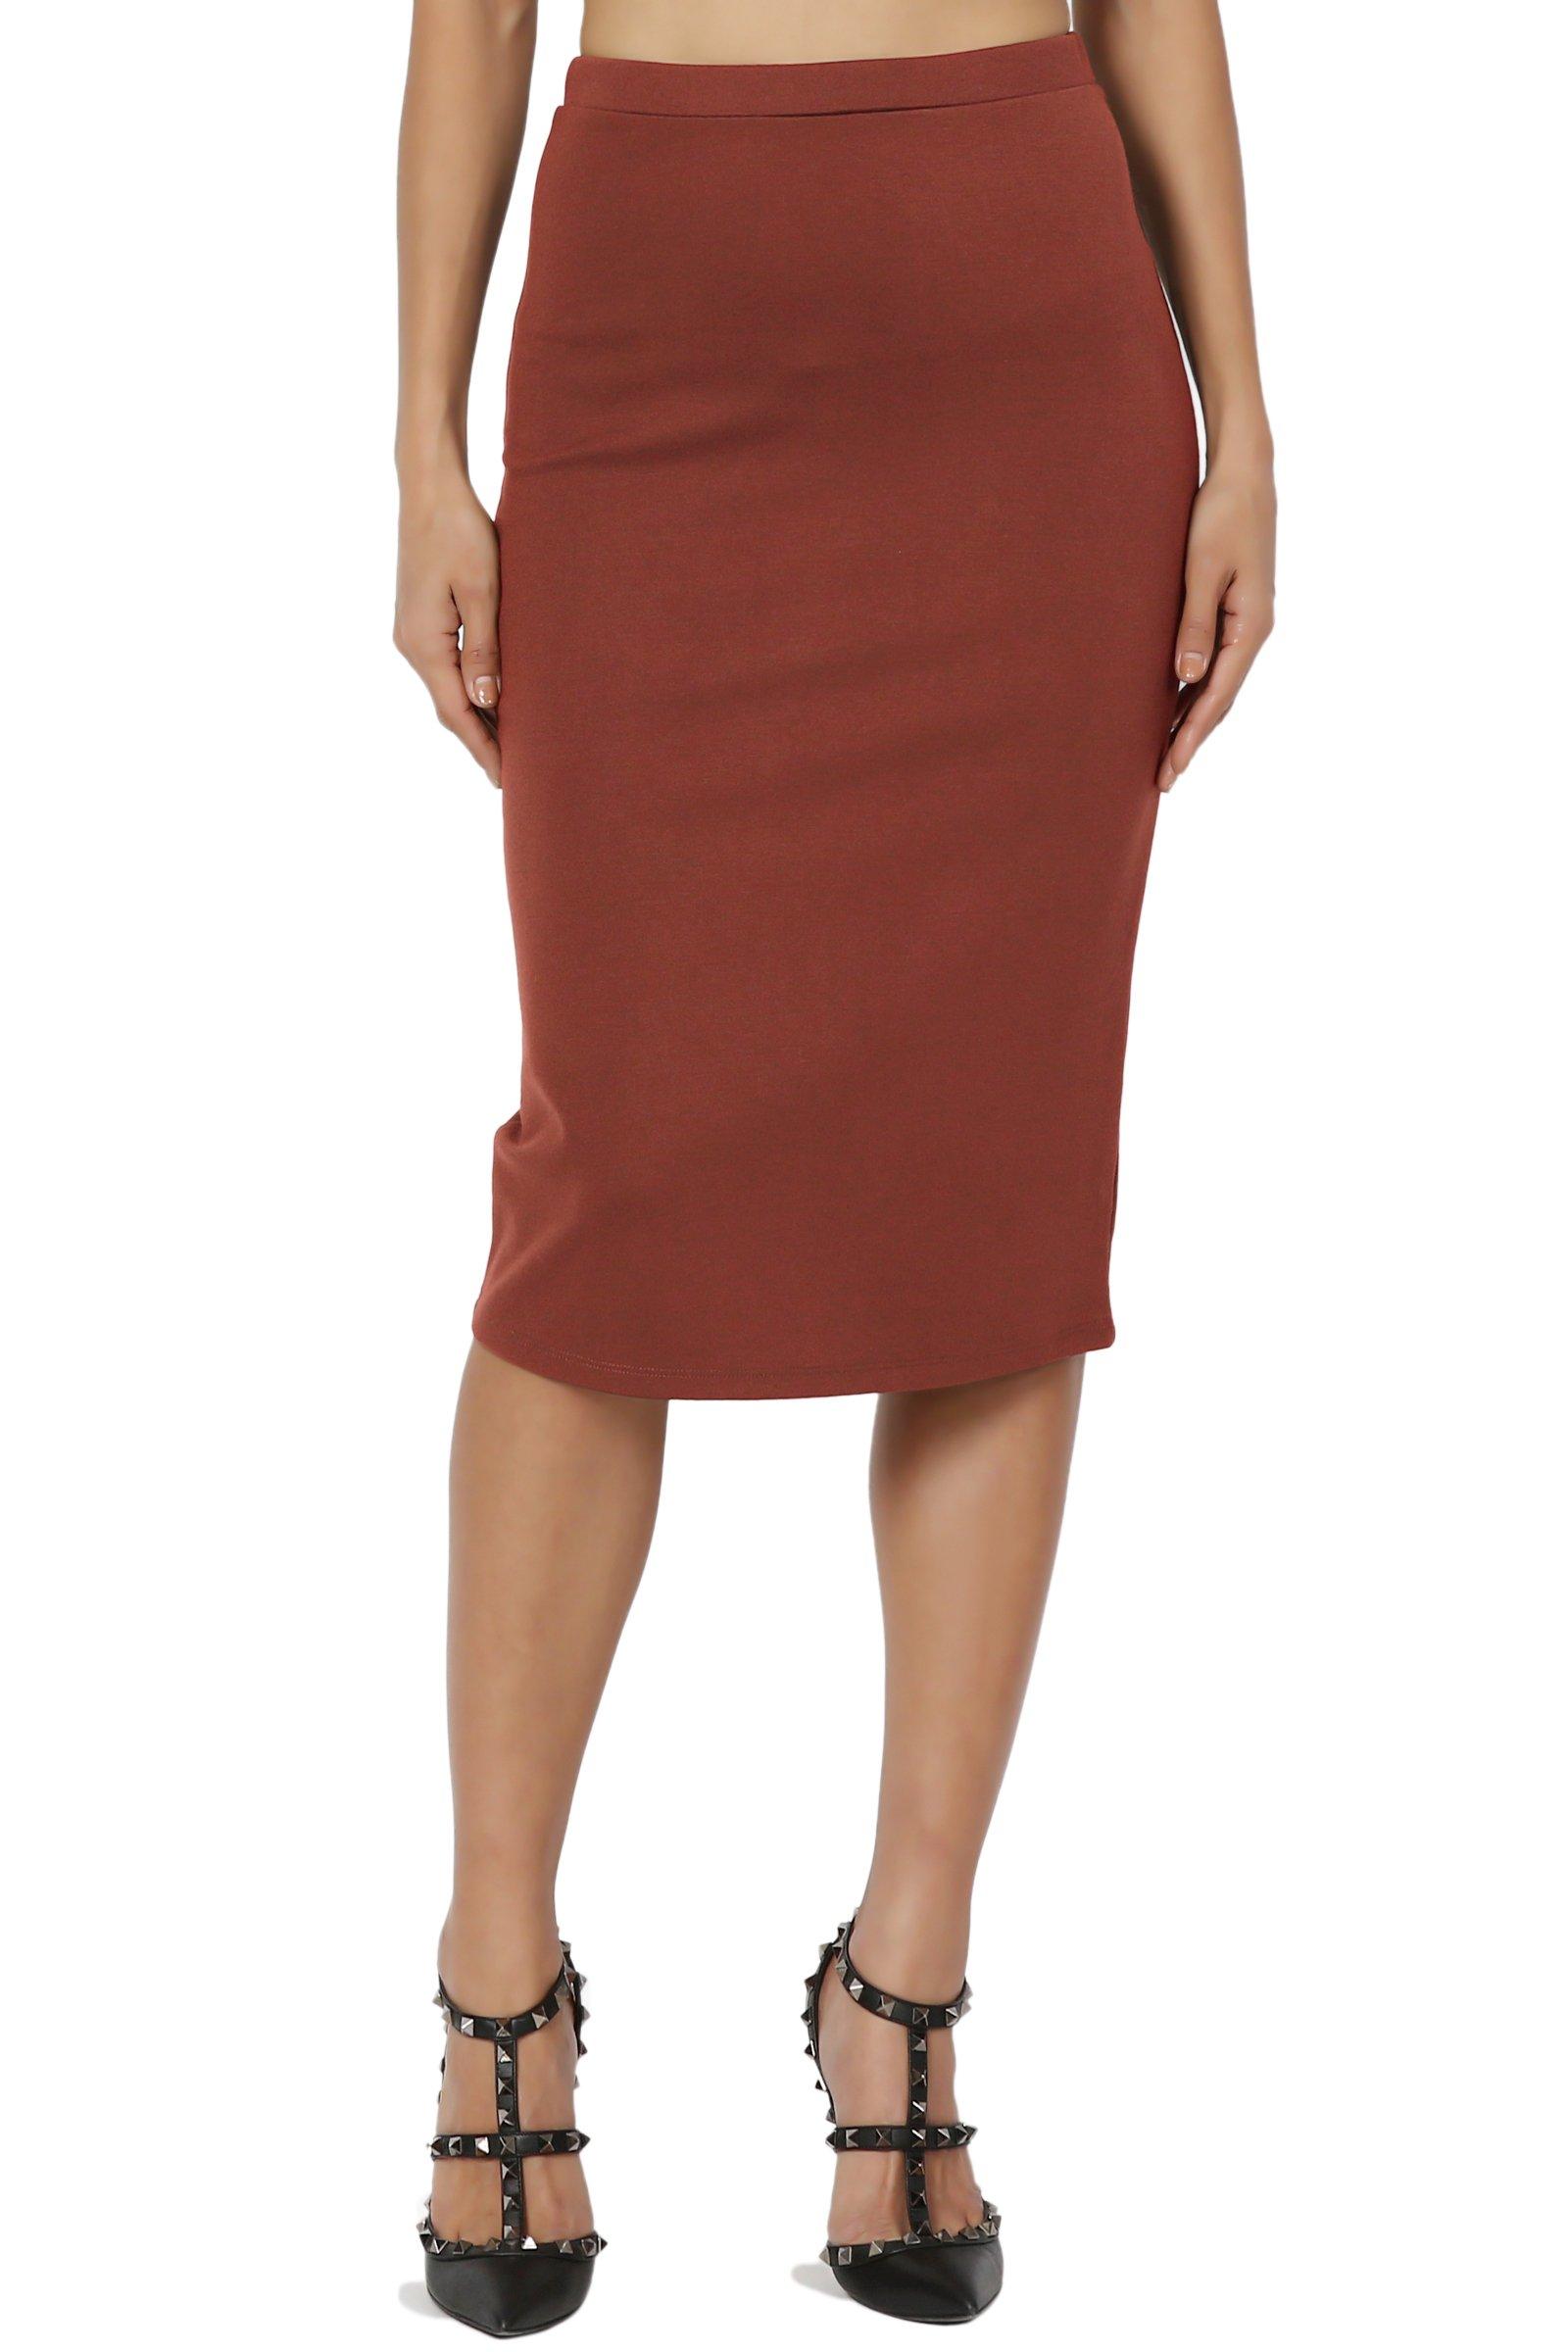 TheMogan Women's Basic Stretch Thick Ponte Knit Pencil Midi Skirt Dark Rust 1XL